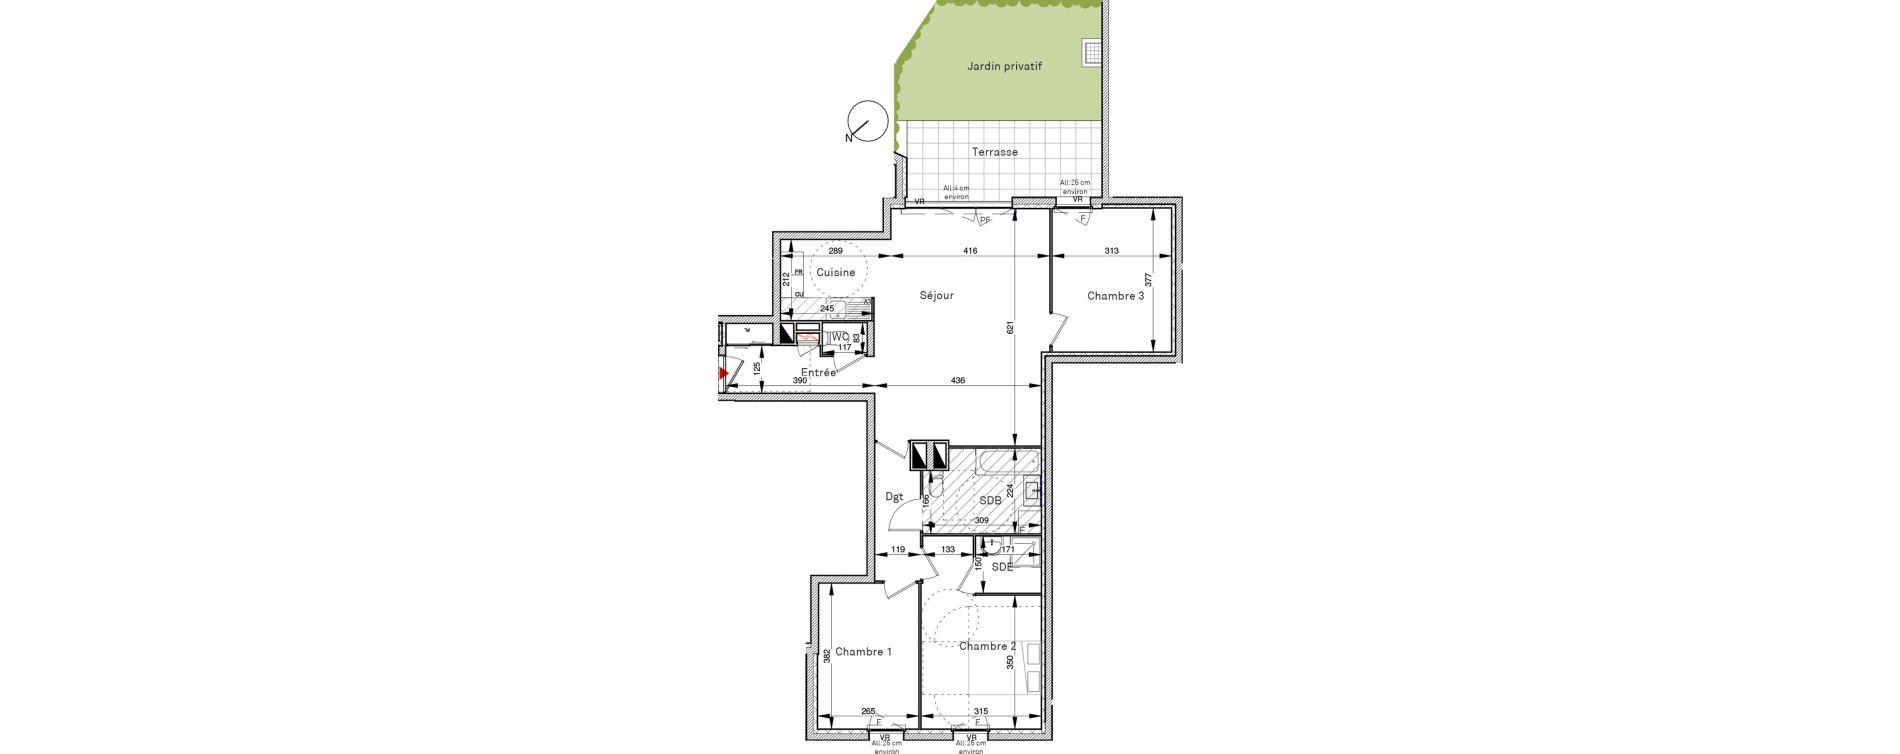 Appartement T4 de 86,84 m2 à Villepinte Vert galant